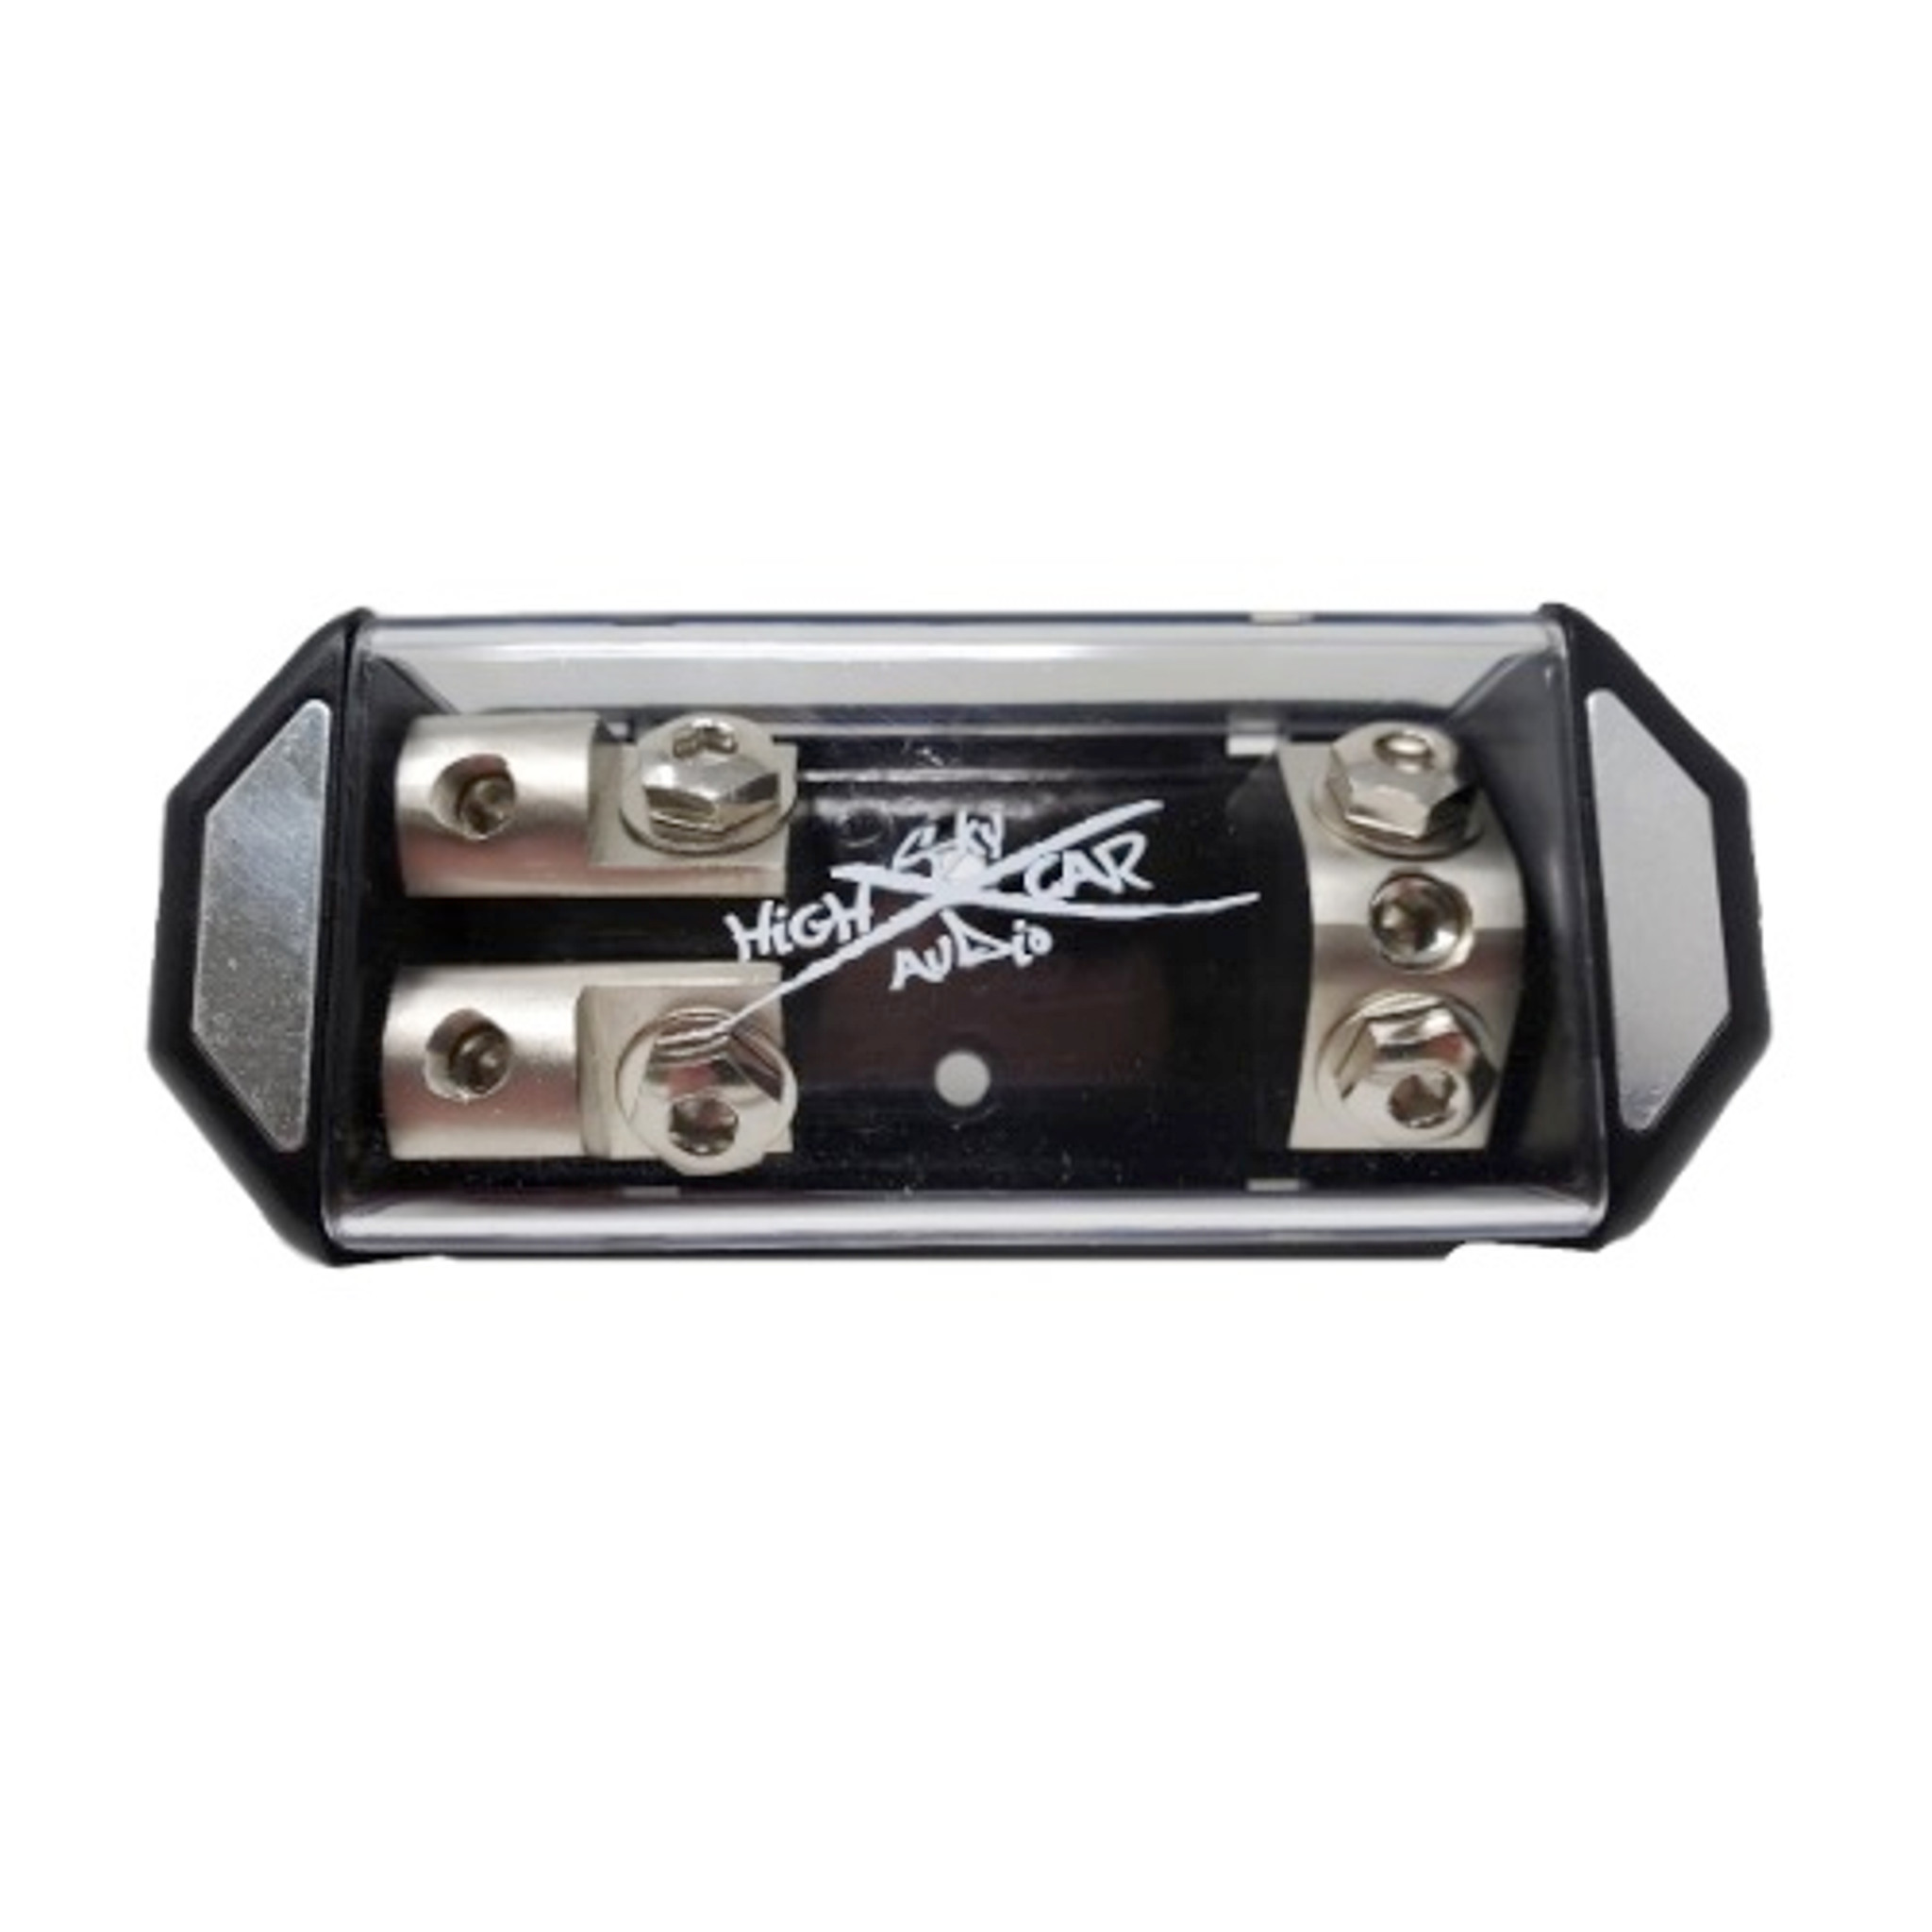 Sky High Car Audio Ring Terminal ANL Fuse Holder BLACK Logo Nickel Plated